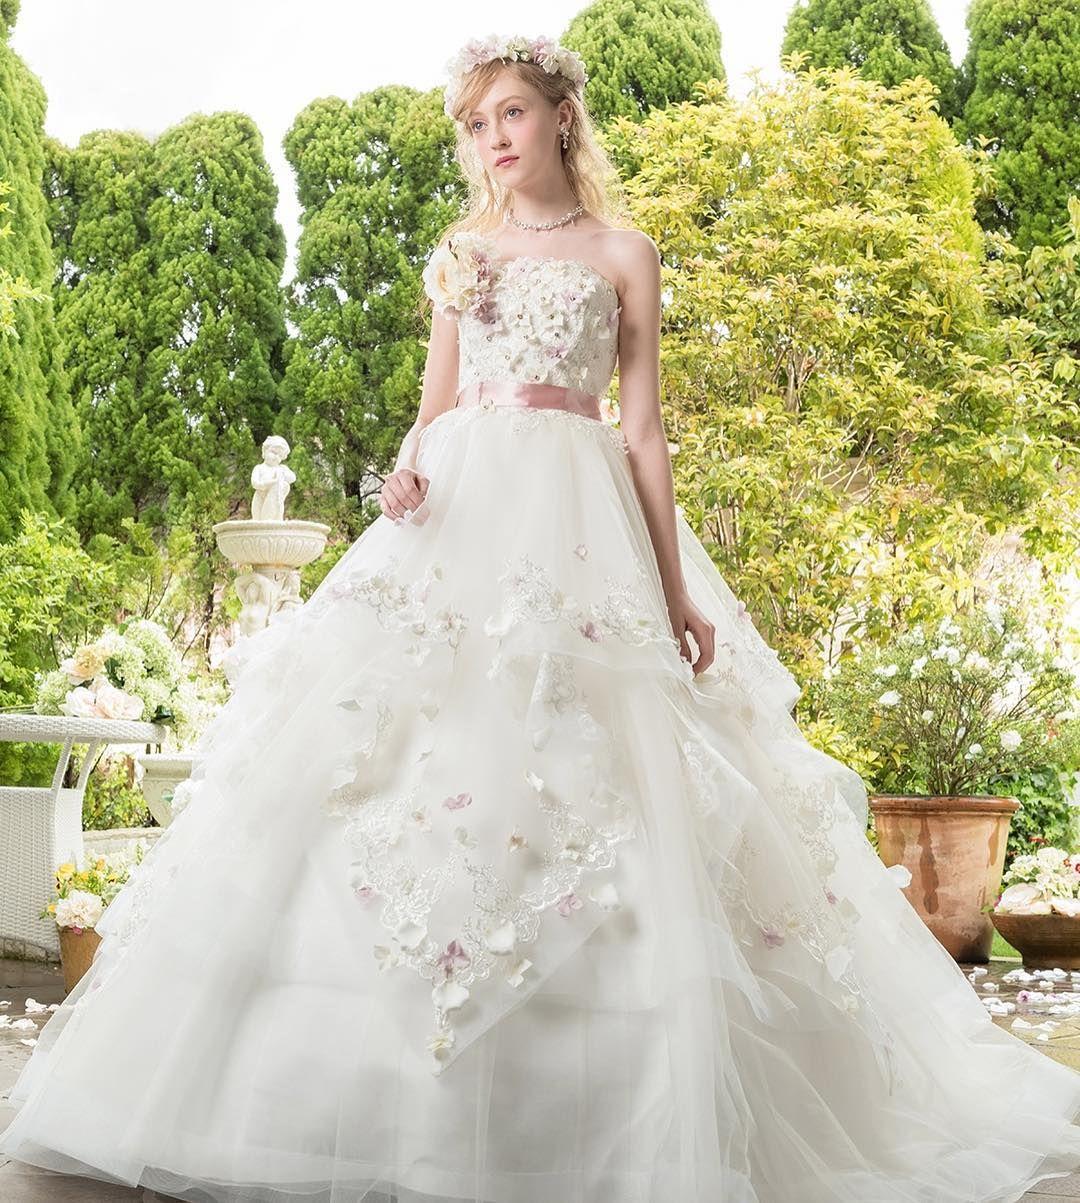 d07ddc309fa5c KR-0144 ふんわりフリルのウェディングドレスにピンクの花びらを散らしてロマンティックに *  結婚式 花嫁 ウェディング ウェディングドレス  カラードレス カクテル ...